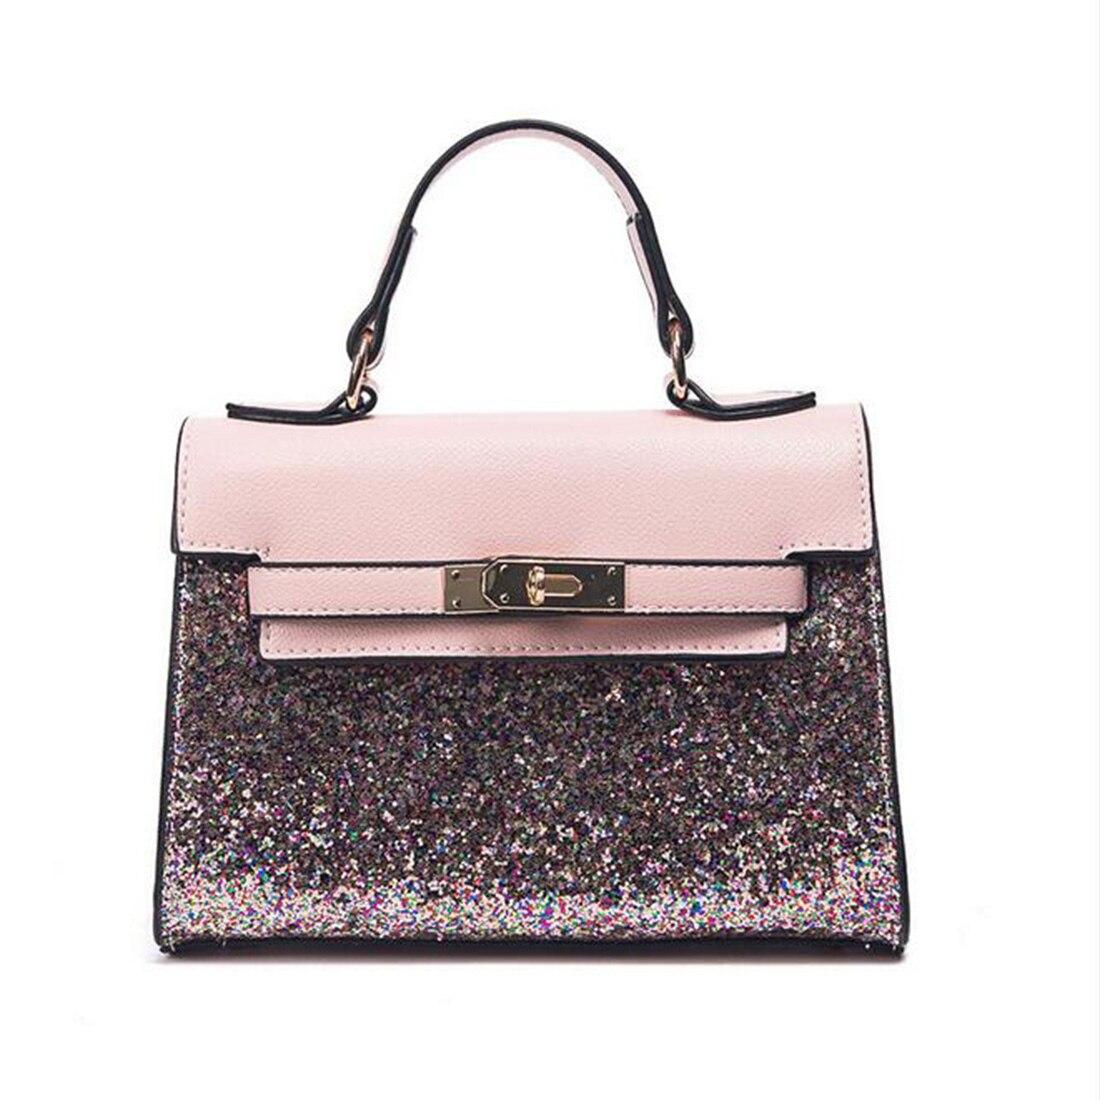 Luxury Handbags Women Bags Designer Handbags High Quality Sequin leather Tote Ba